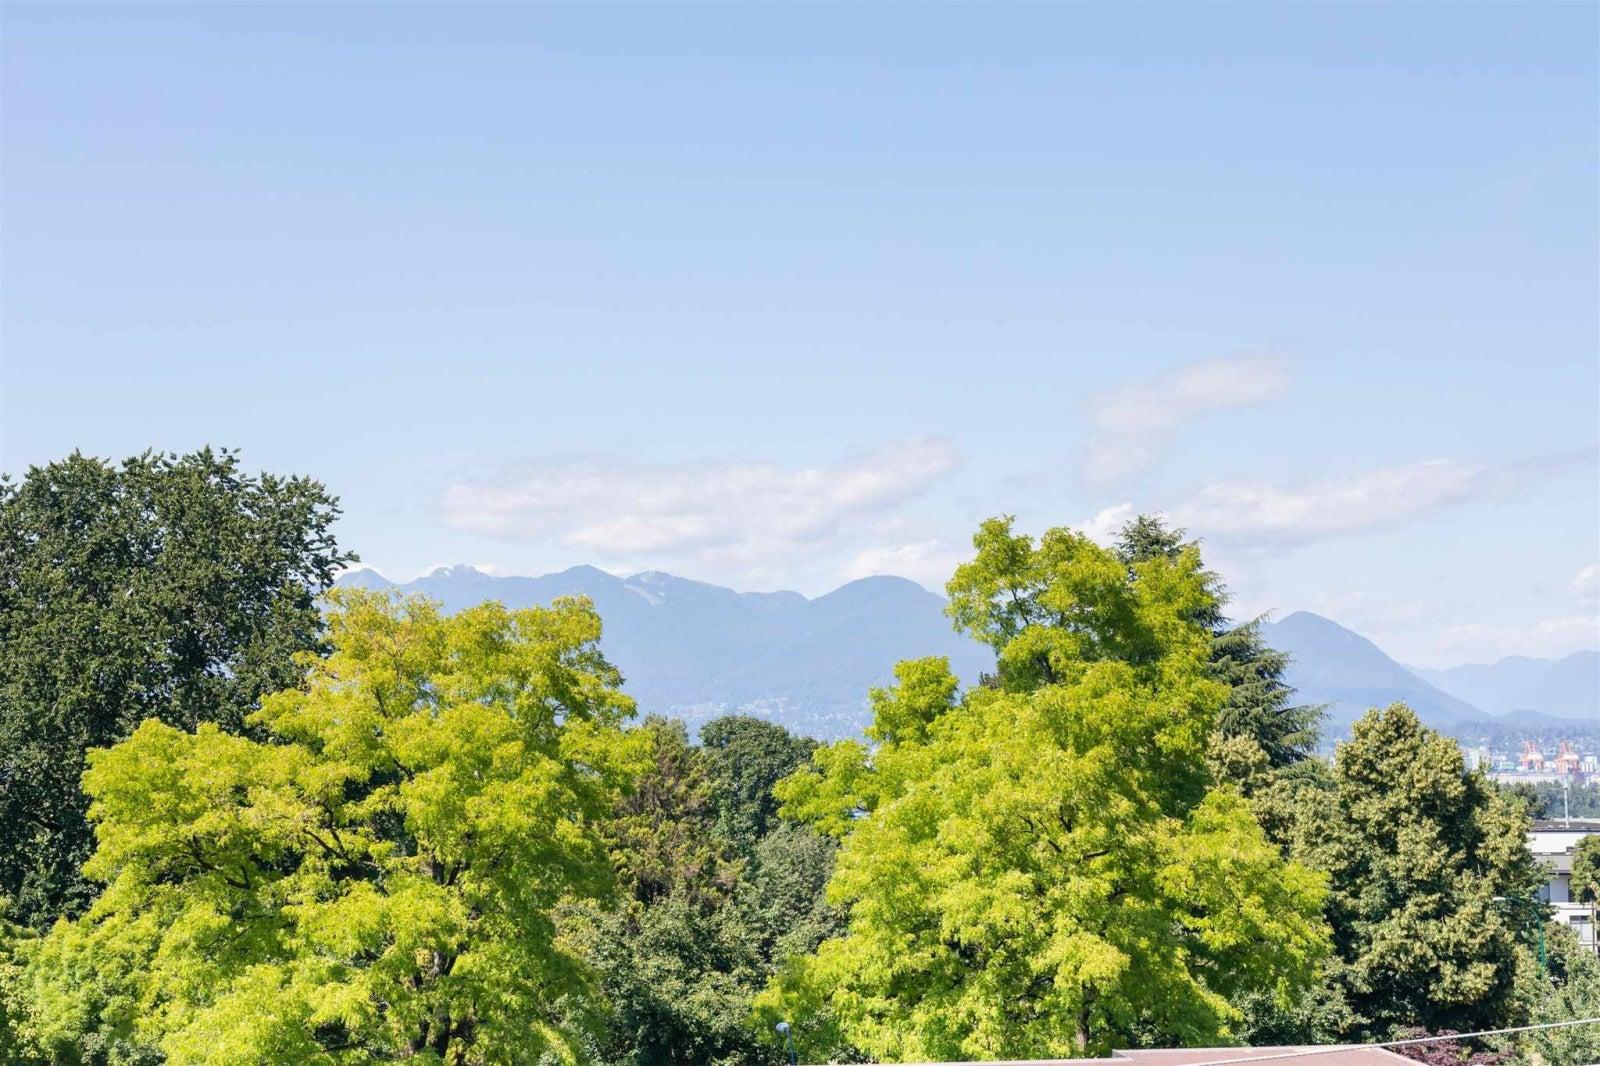 408 379 E BROADWAY AVENUE - Mount Pleasant VE Apartment/Condo for sale, 2 Bedrooms (R2599900) #24